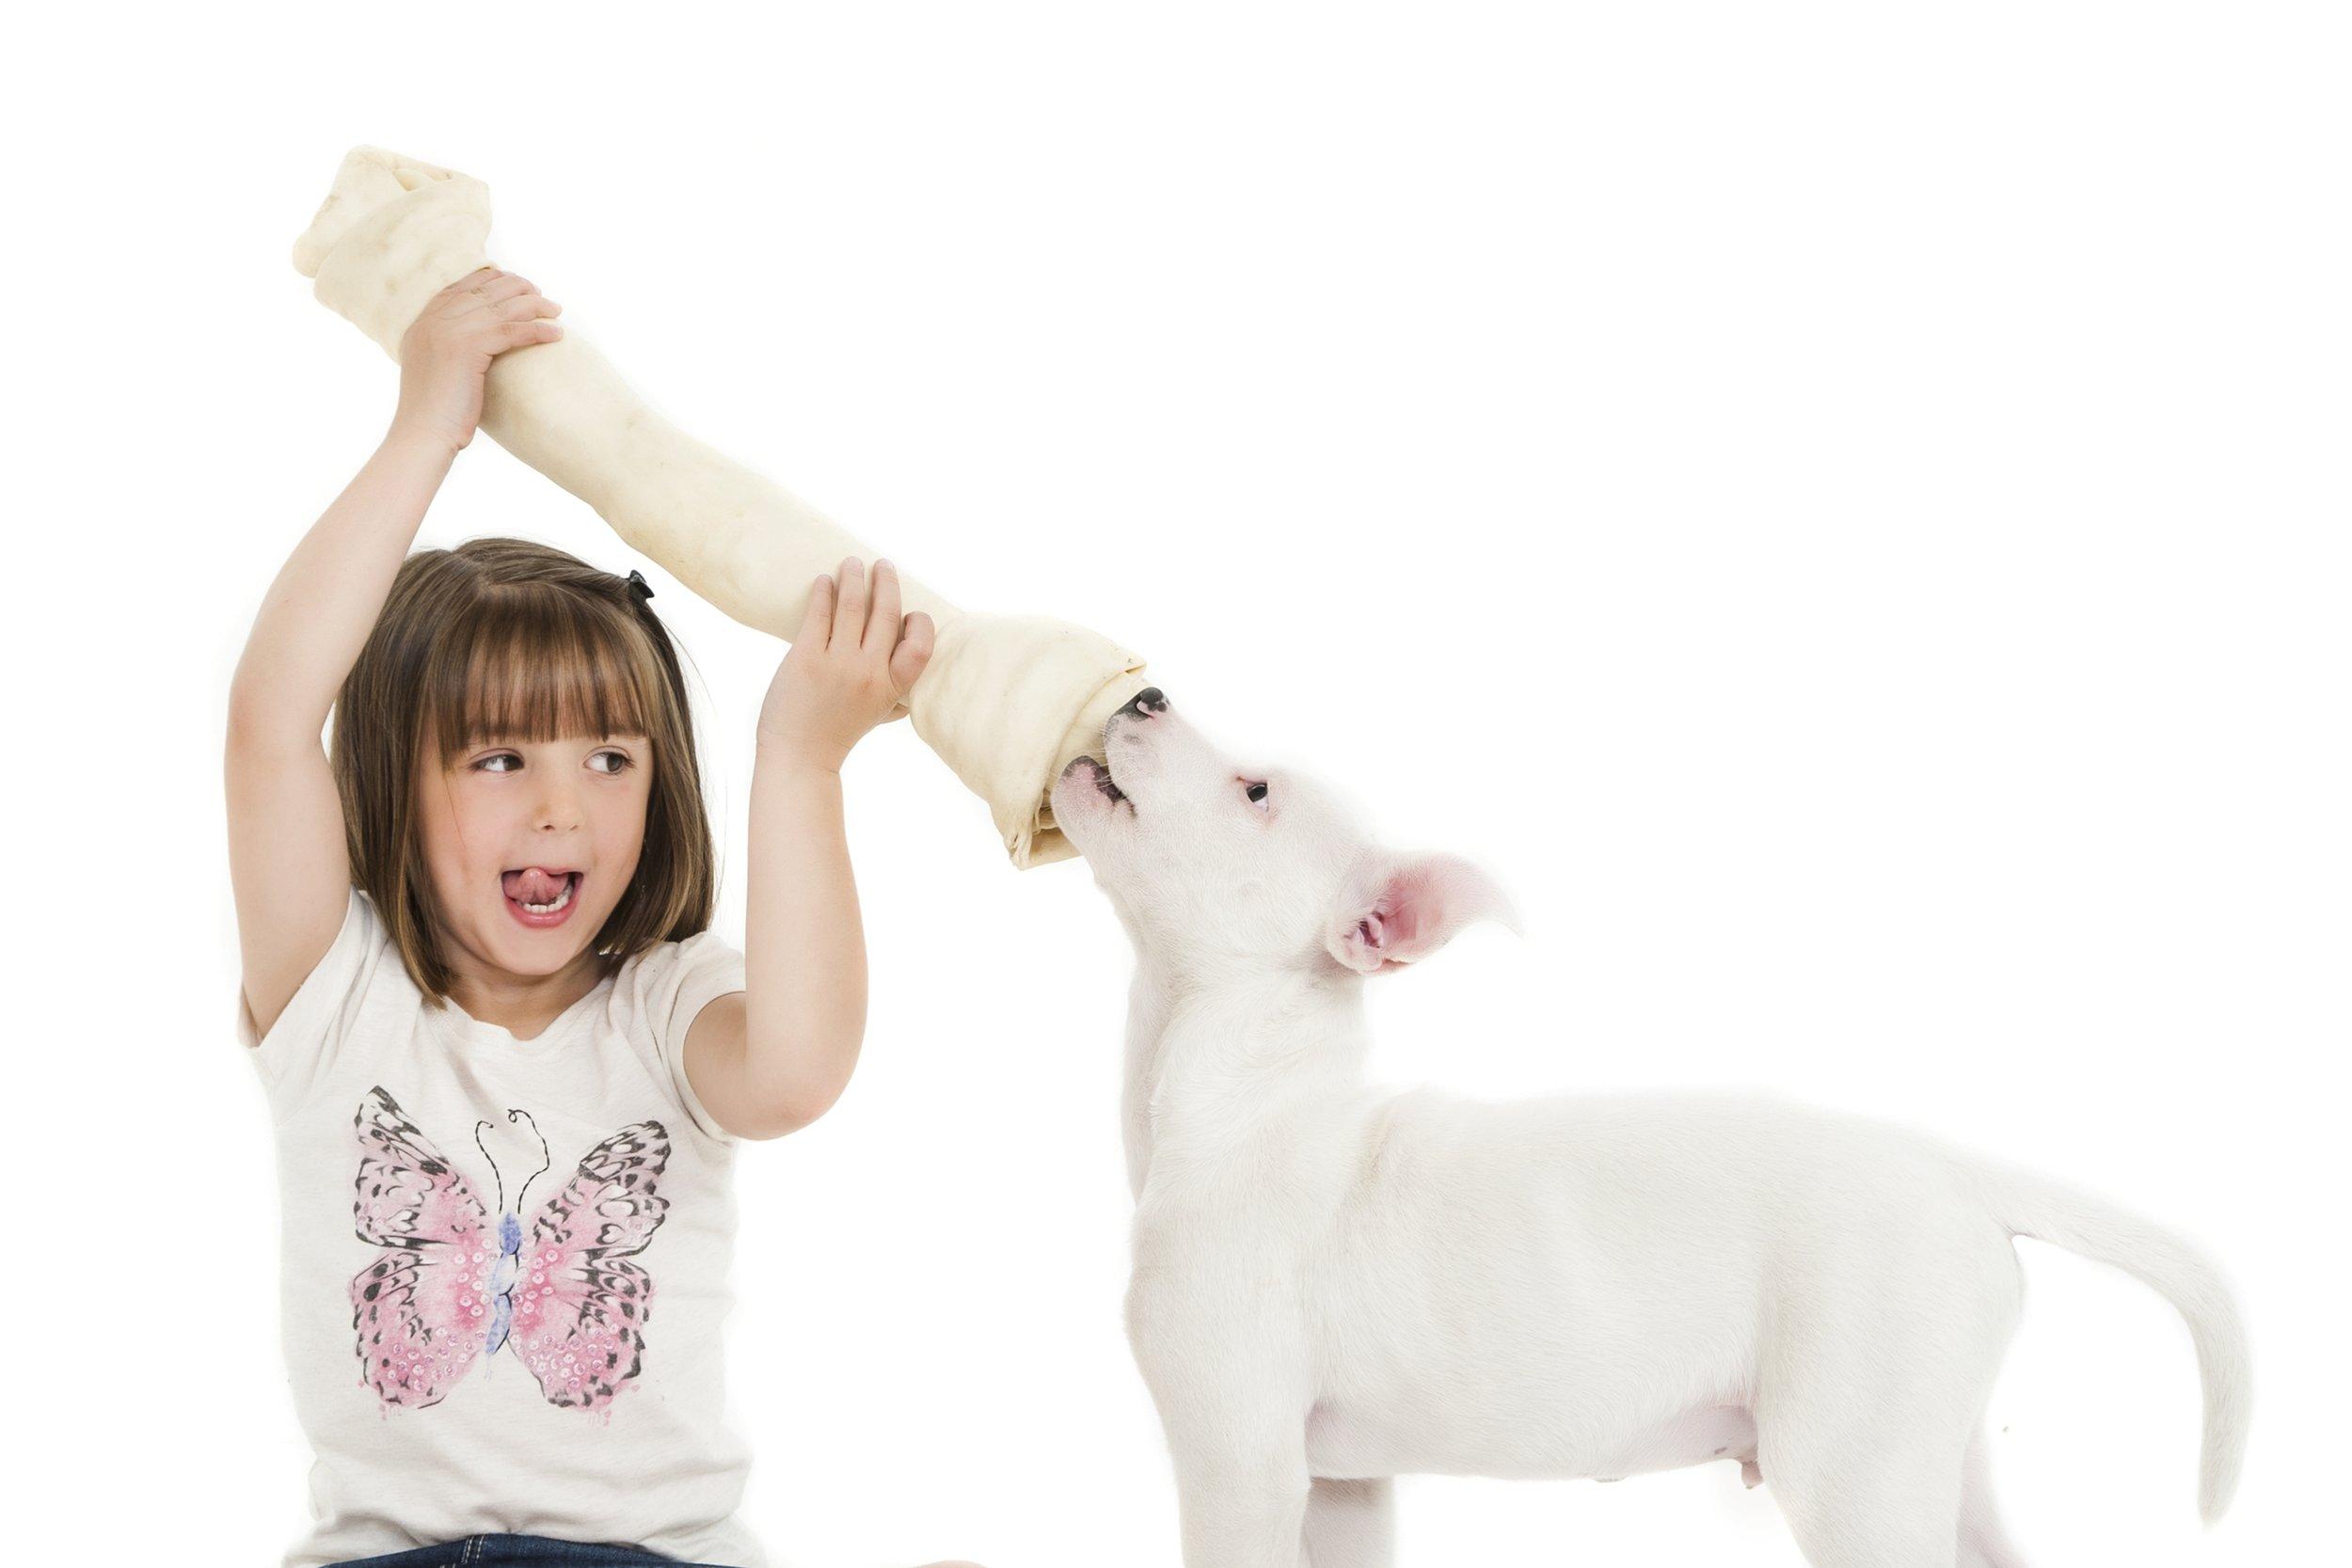 zigzag-photography-leicester-zig-zag-photographers-photo-studio-clarendon-park-queens-road-best-family-portraits-children-pet-dog-bone-animal.jpg